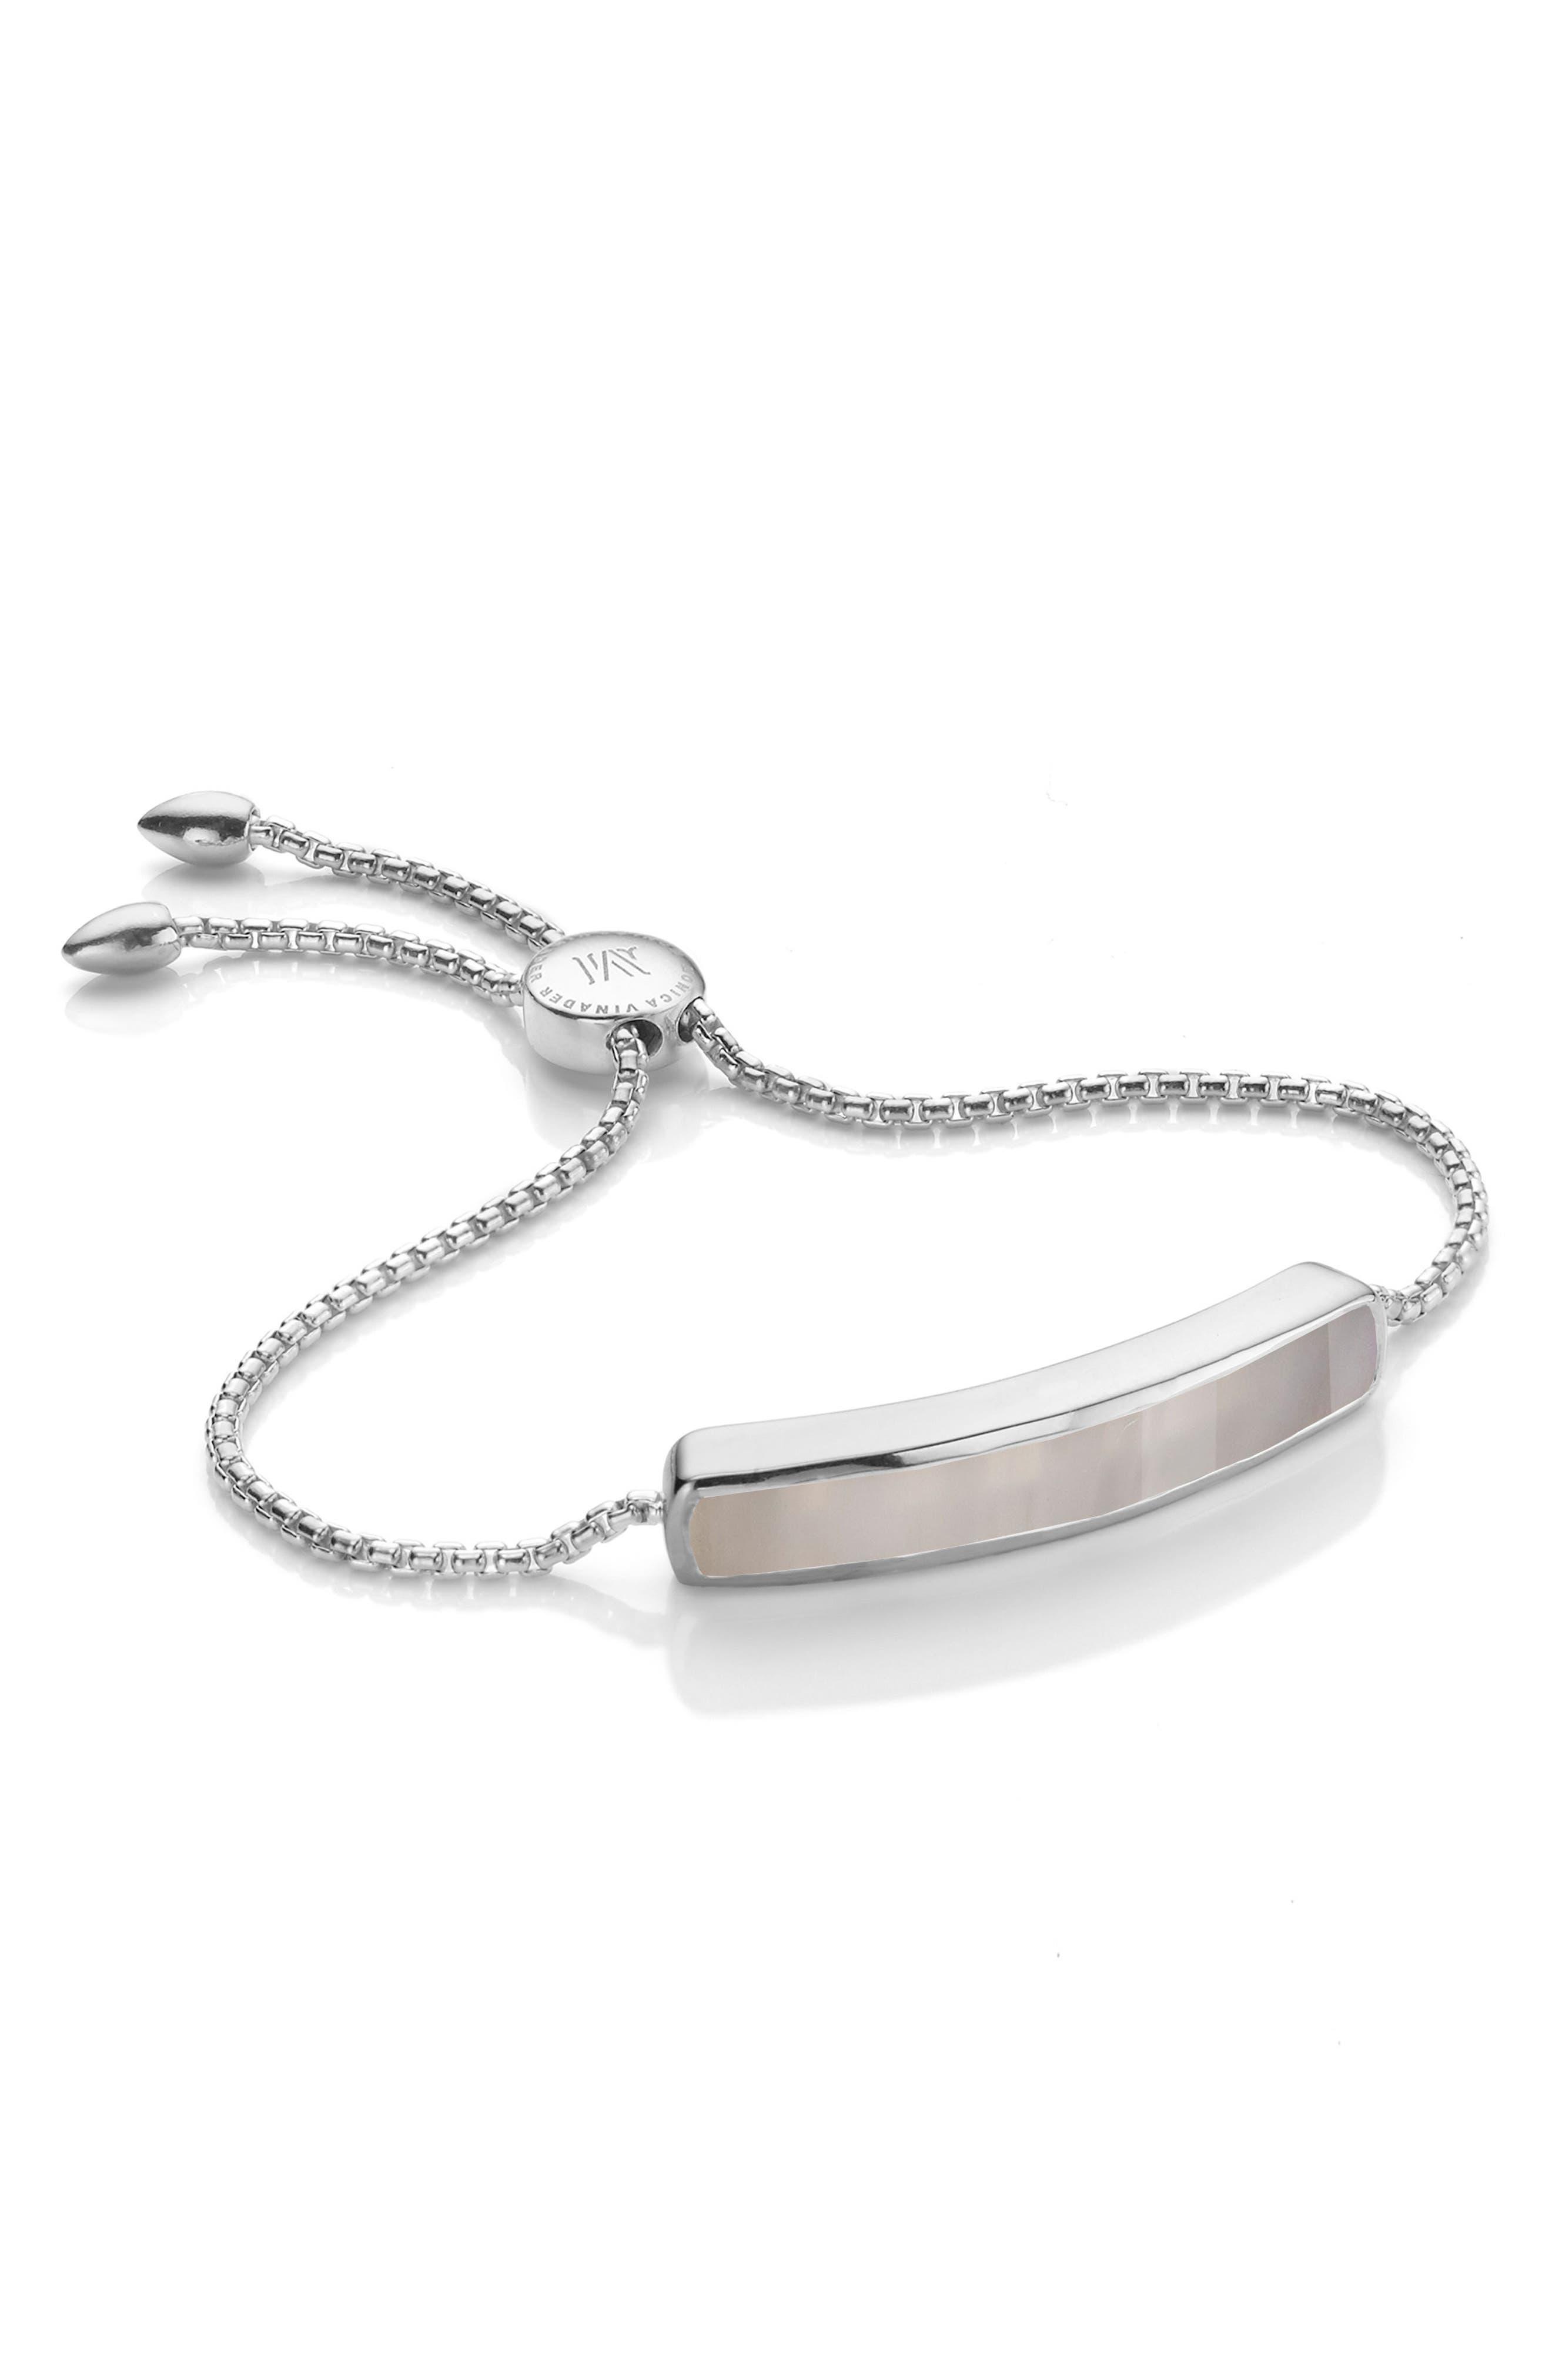 Baja Sterling Stone Bracelet,                         Main,                         color, GREY AGATE/ SILVER